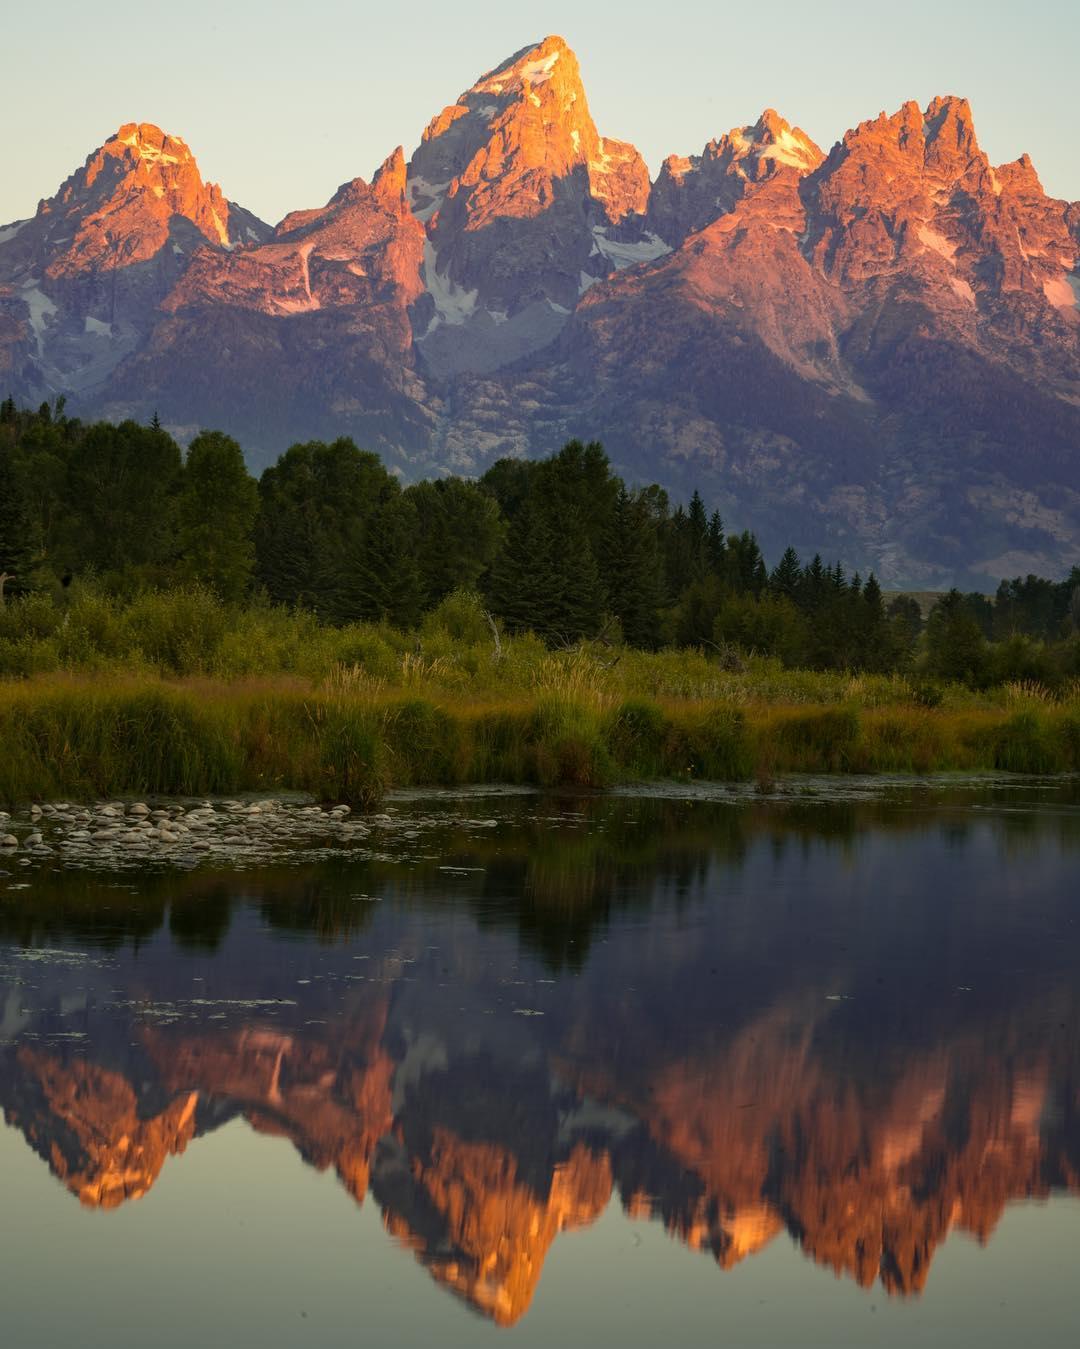 USA Photography, landscape photography